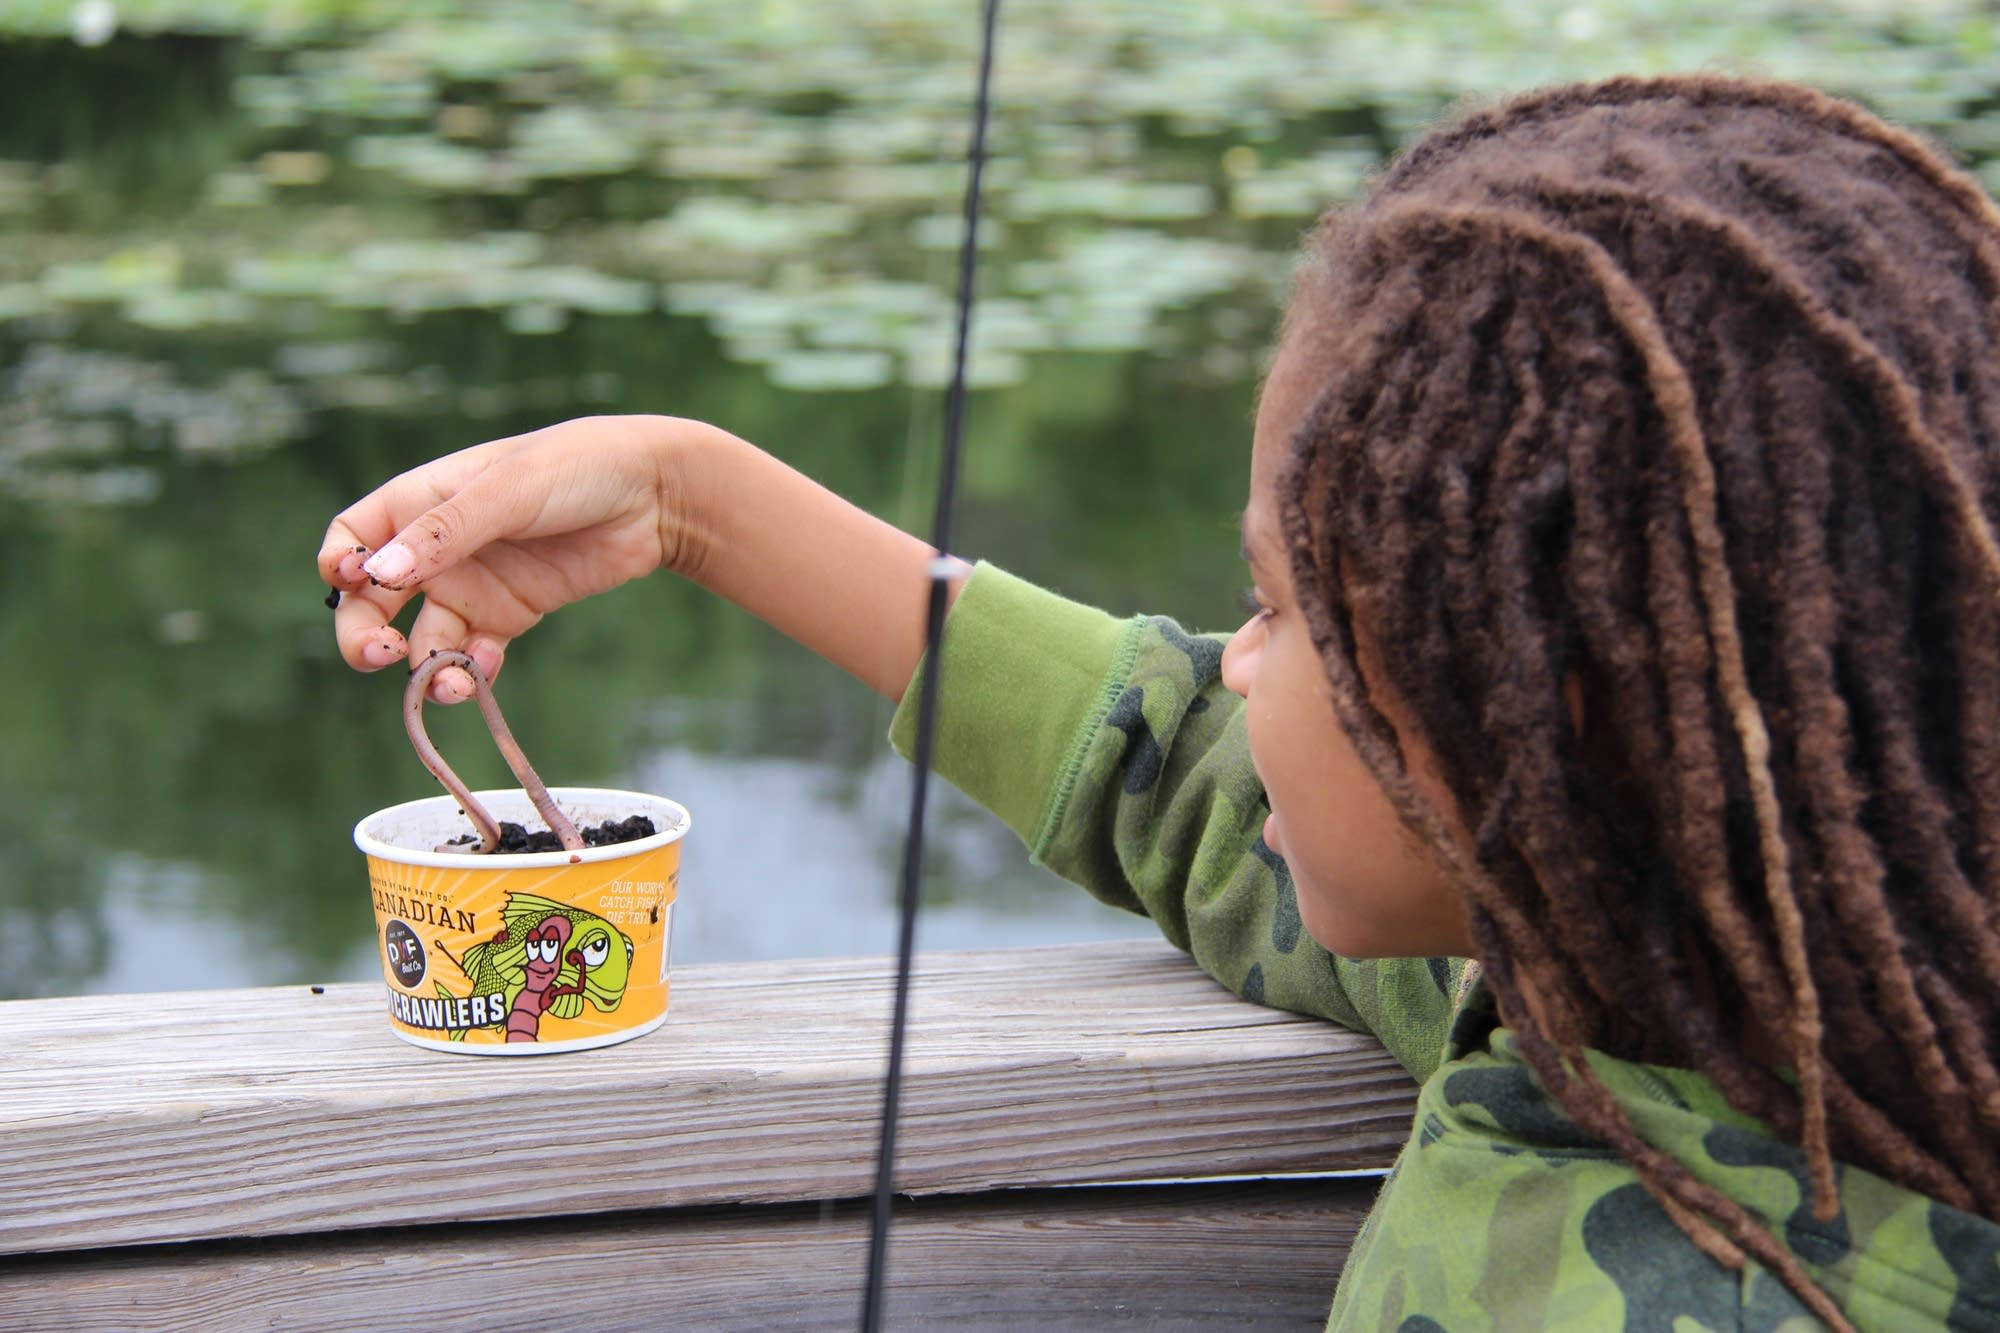 Amitri Hosea picks up a fresh worm while fishing on Lake Snelling.